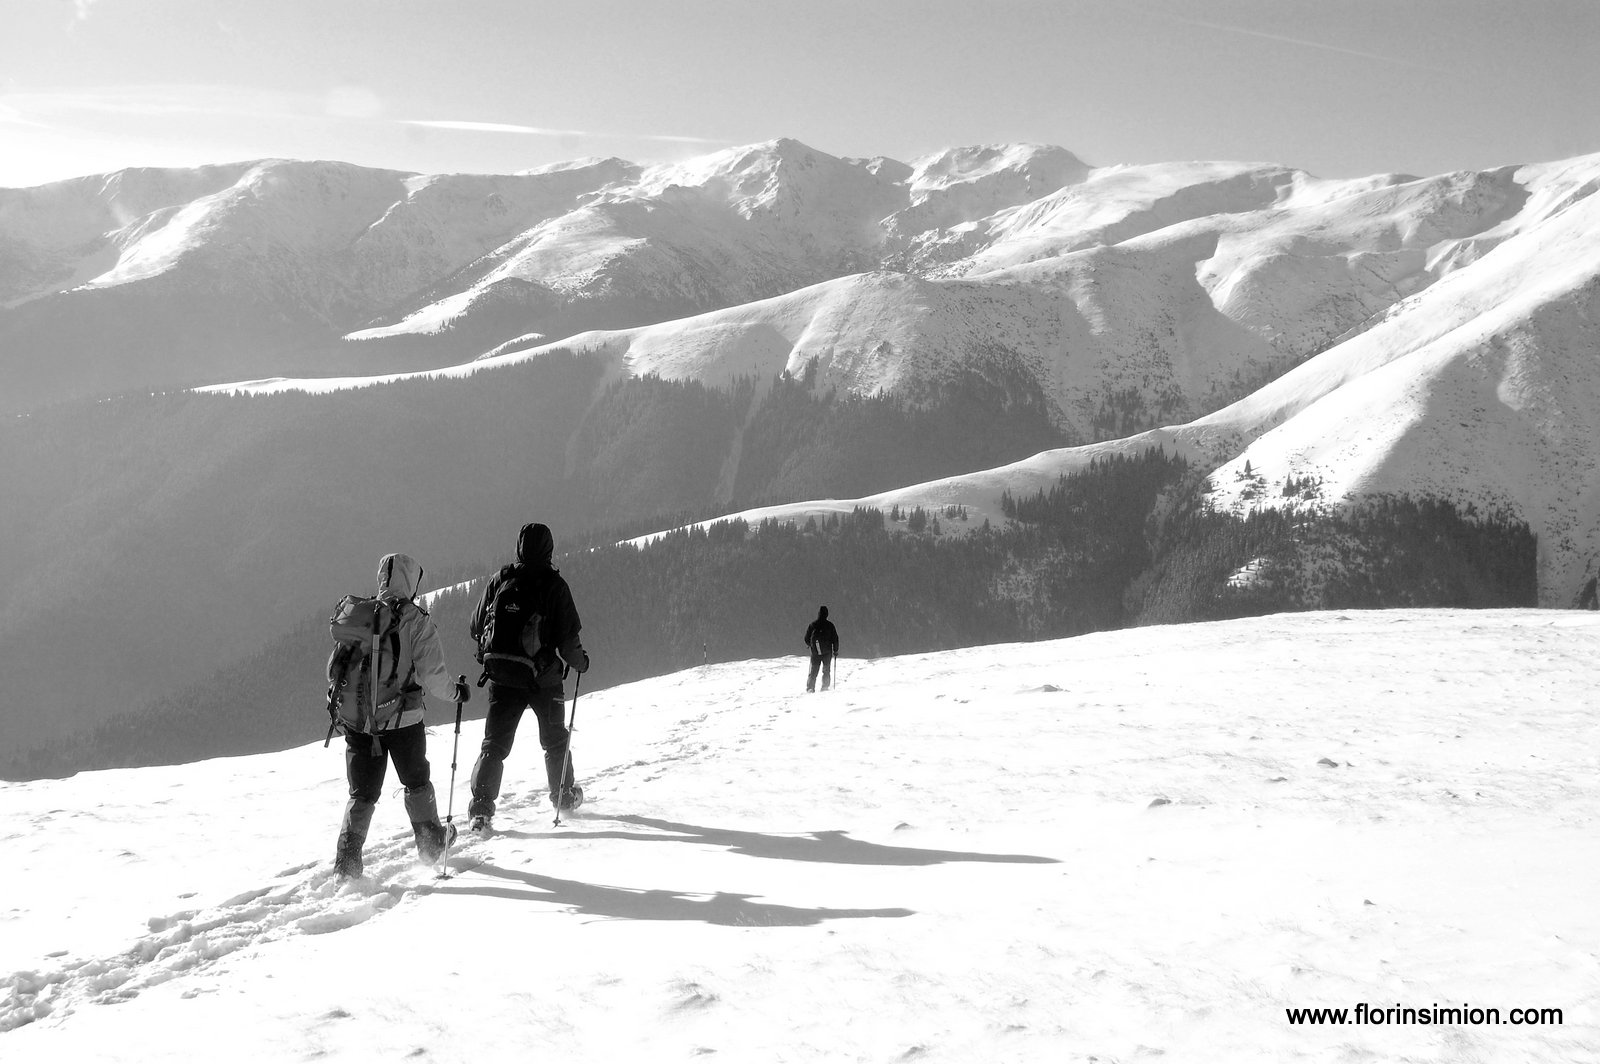 Tura de iarna: Iezer-Papusa – 12-13 Ianuarie 2013